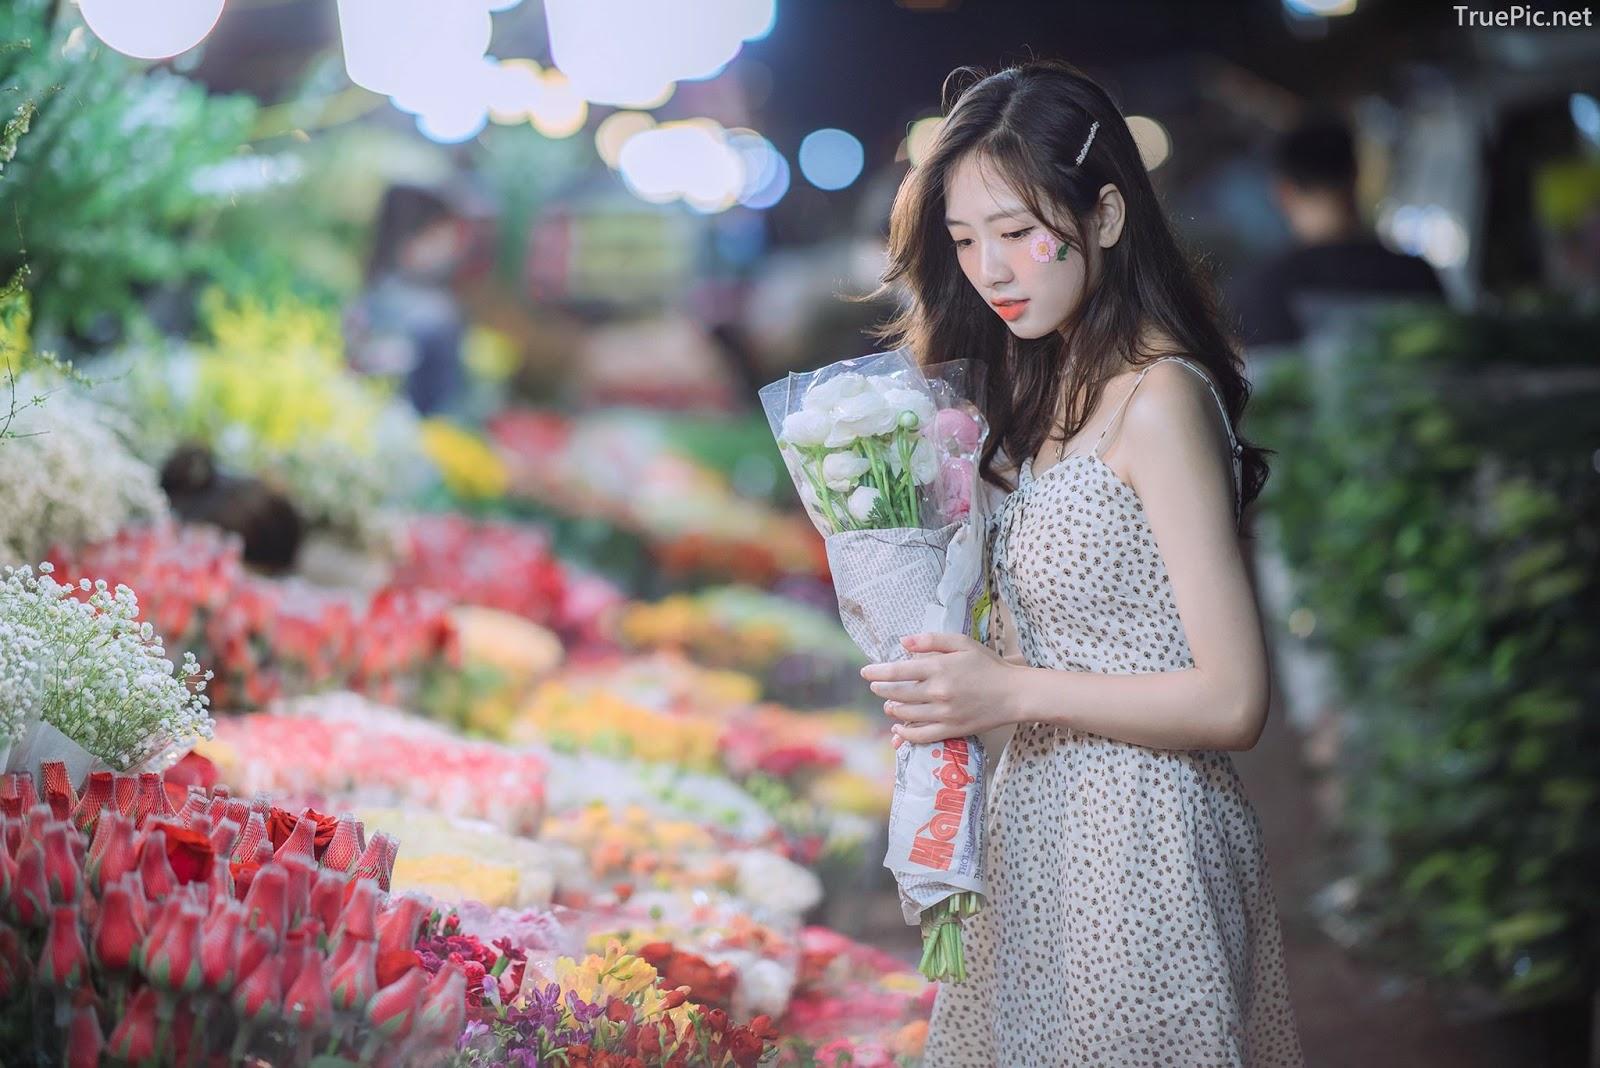 Vietnamese Hot Girl Linh Hoai - Strolling on the flower street - TruePic.net - Picture 2